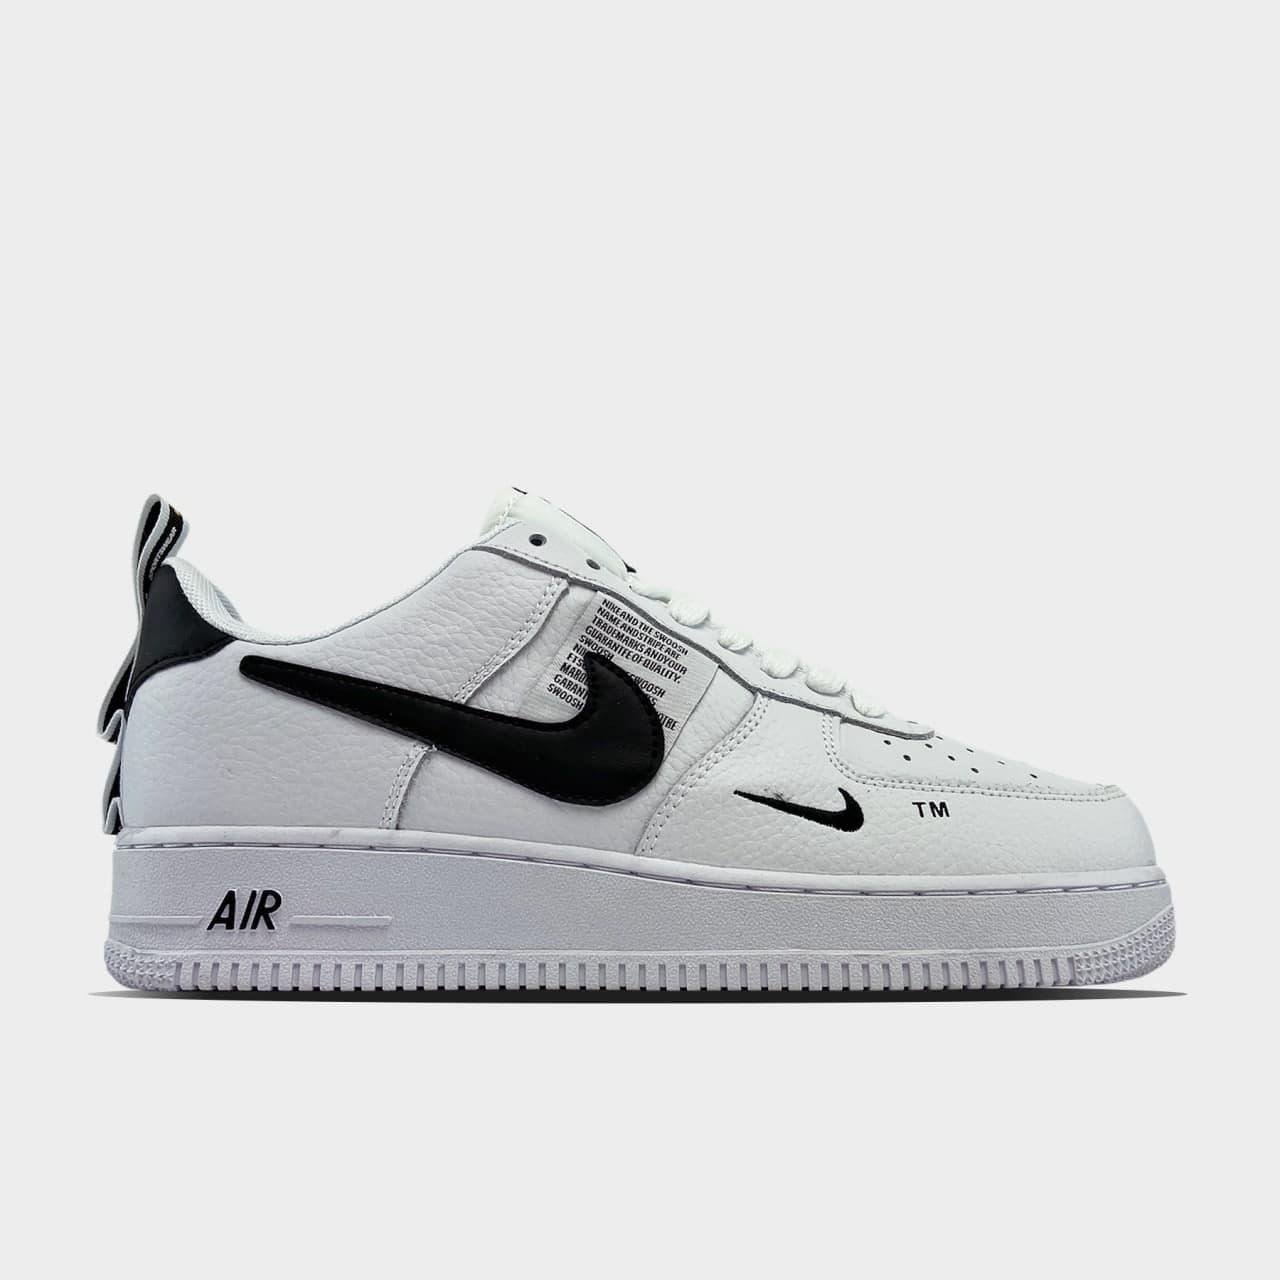 Кроссовки Nike Air Force 1 Utility White мужские, белого цвета, Найк Аир Форс 41